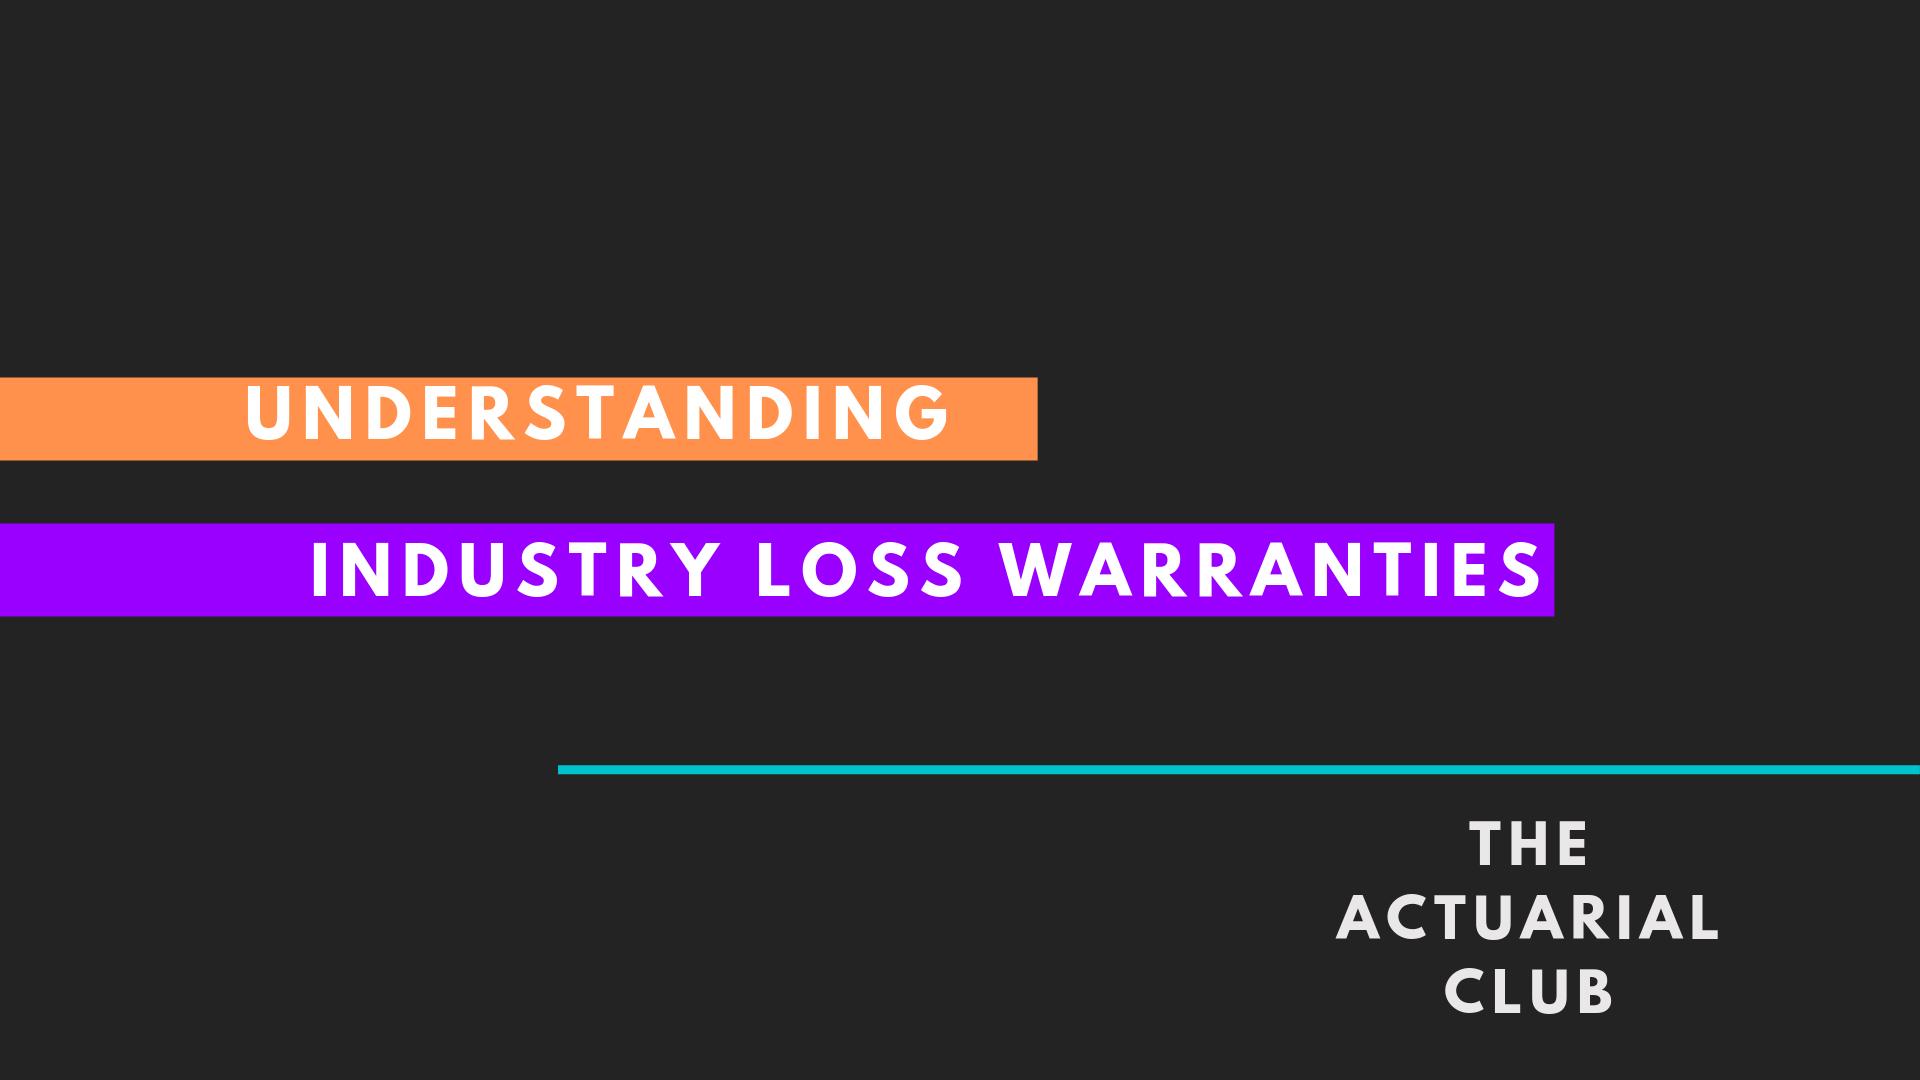 Industry Loss Warranties (ILWs)